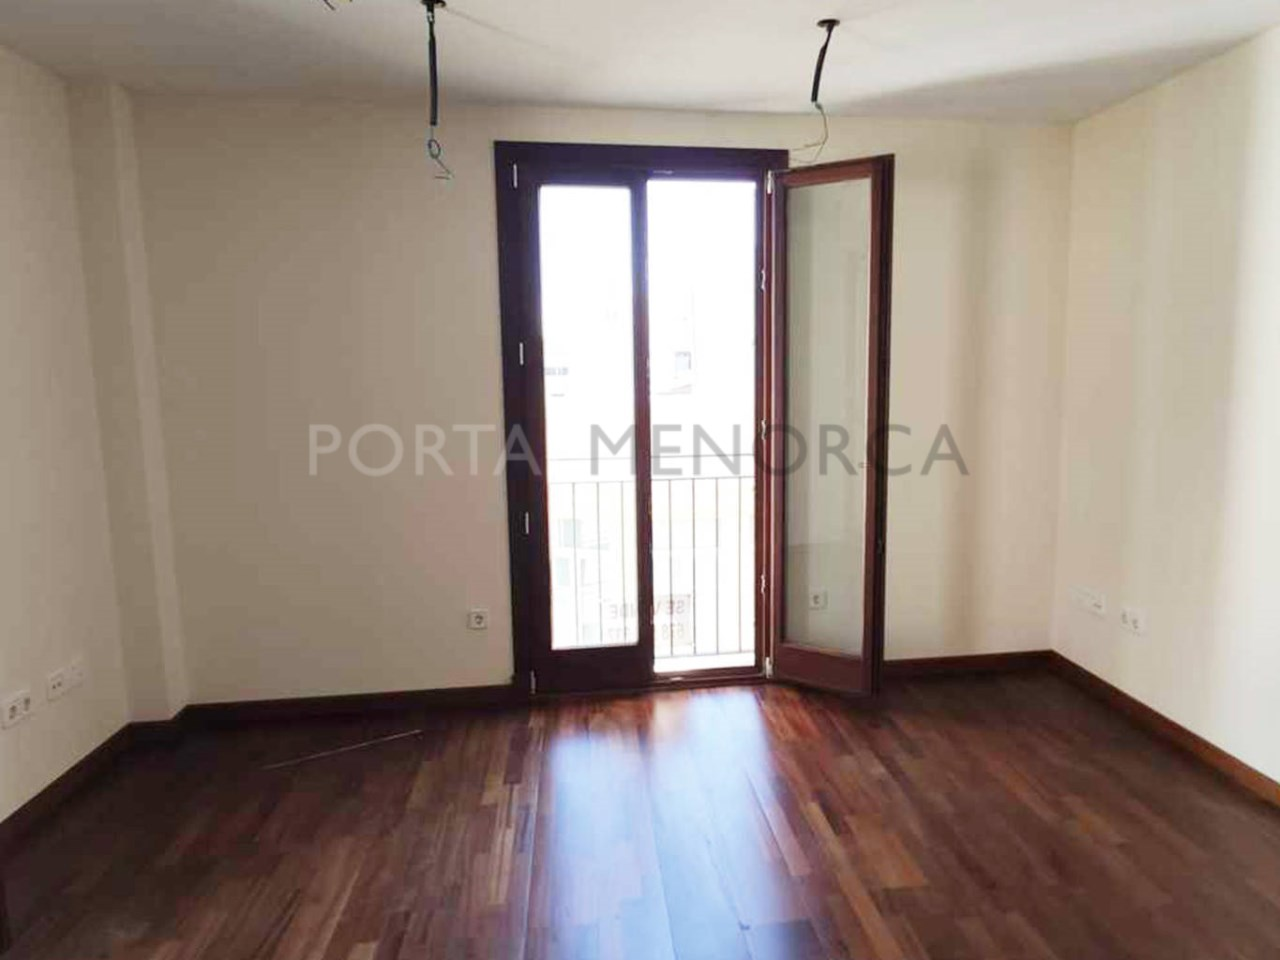 Apartment in the center of Ciutadella_living room